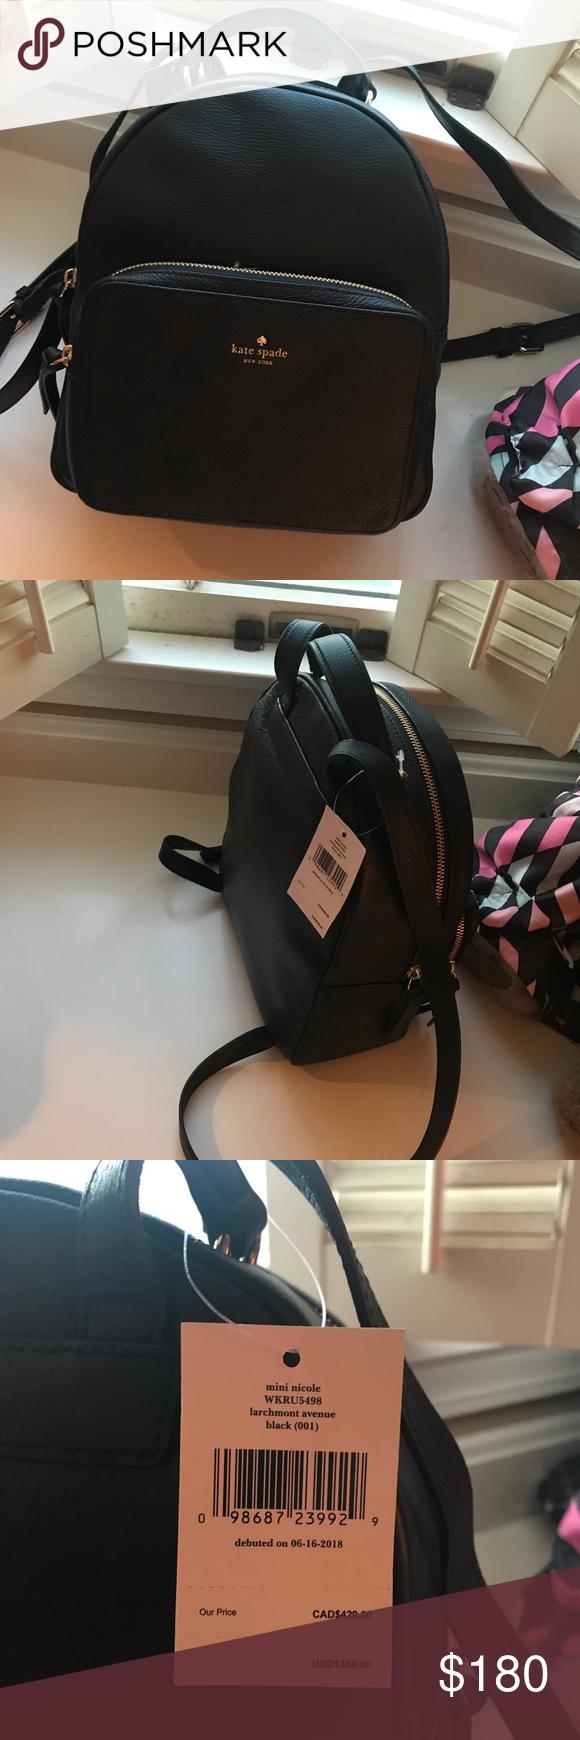 0311d718f9db Kate Spade black backpack Mini Nicole larchmont Avenue kate spade Bags  Backpacks